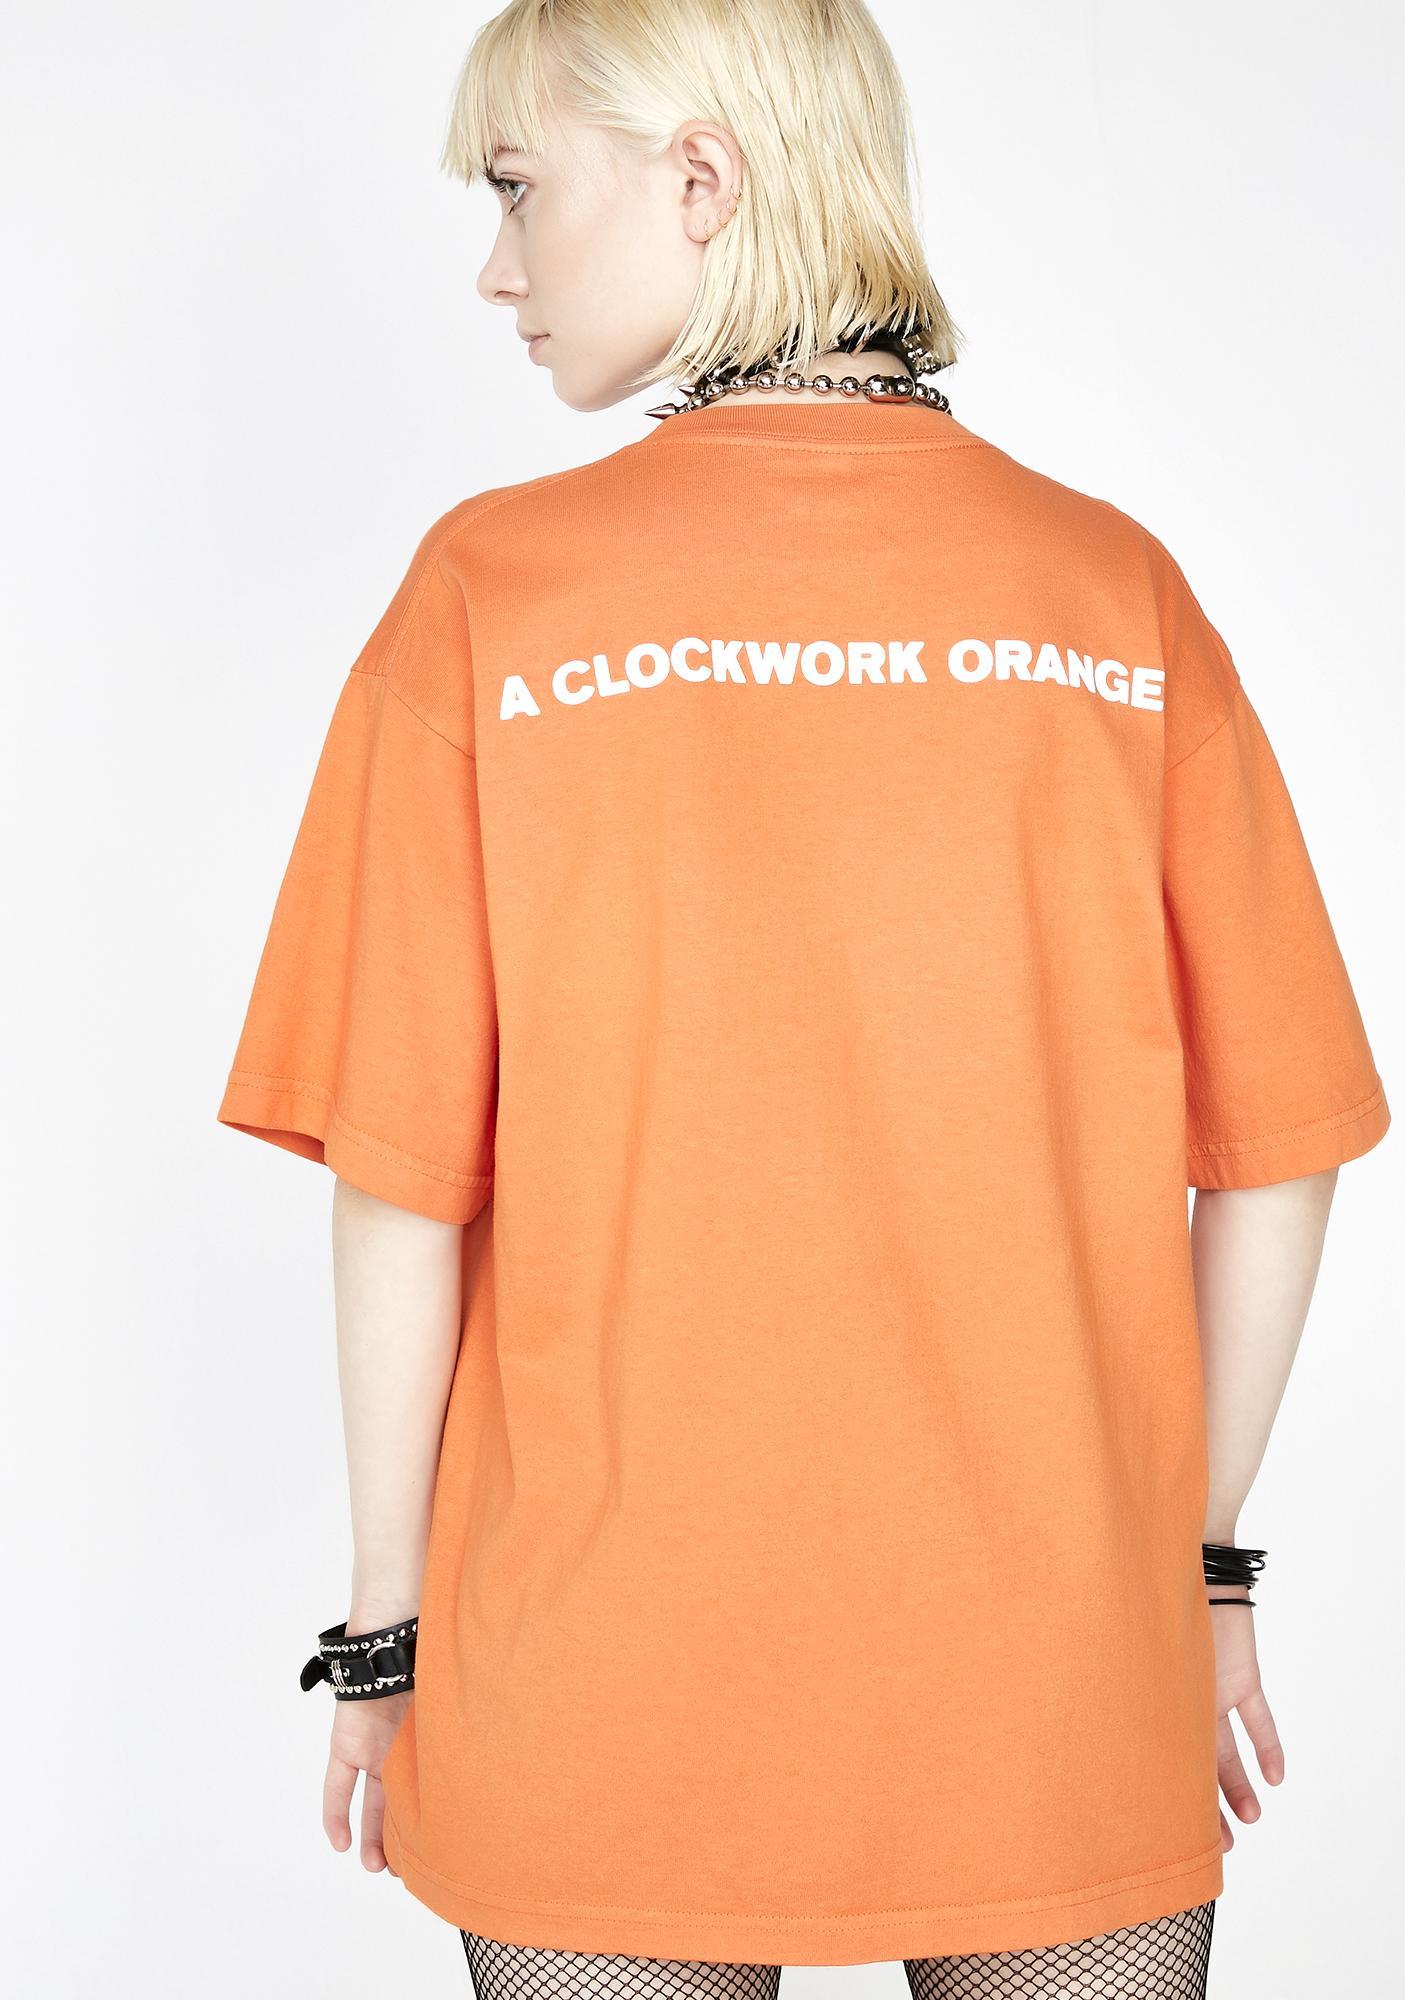 Dumbgood Clockwork Orange Alex Tee